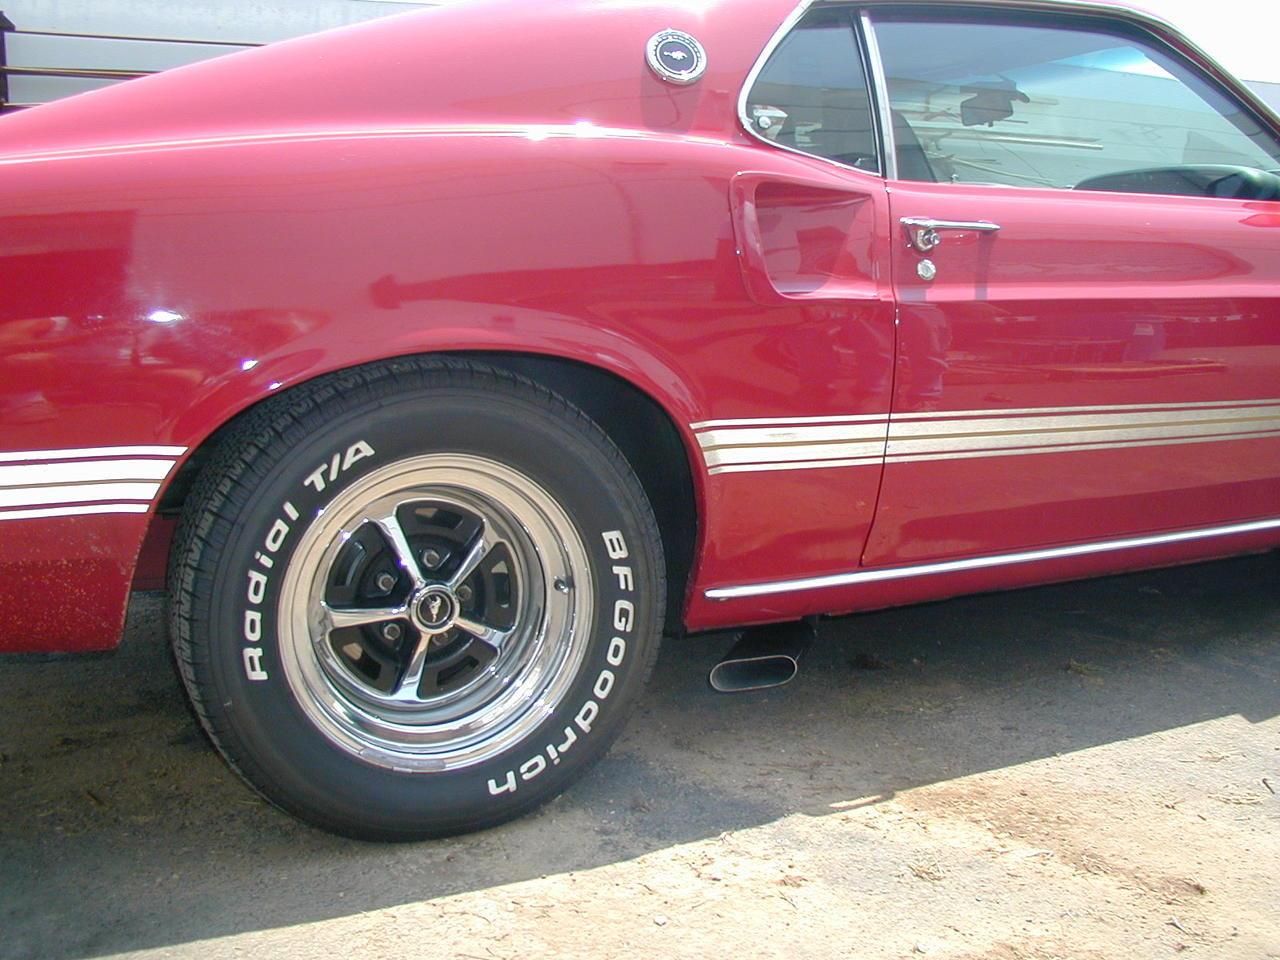 Mustang 1965-1985 SpinTech System